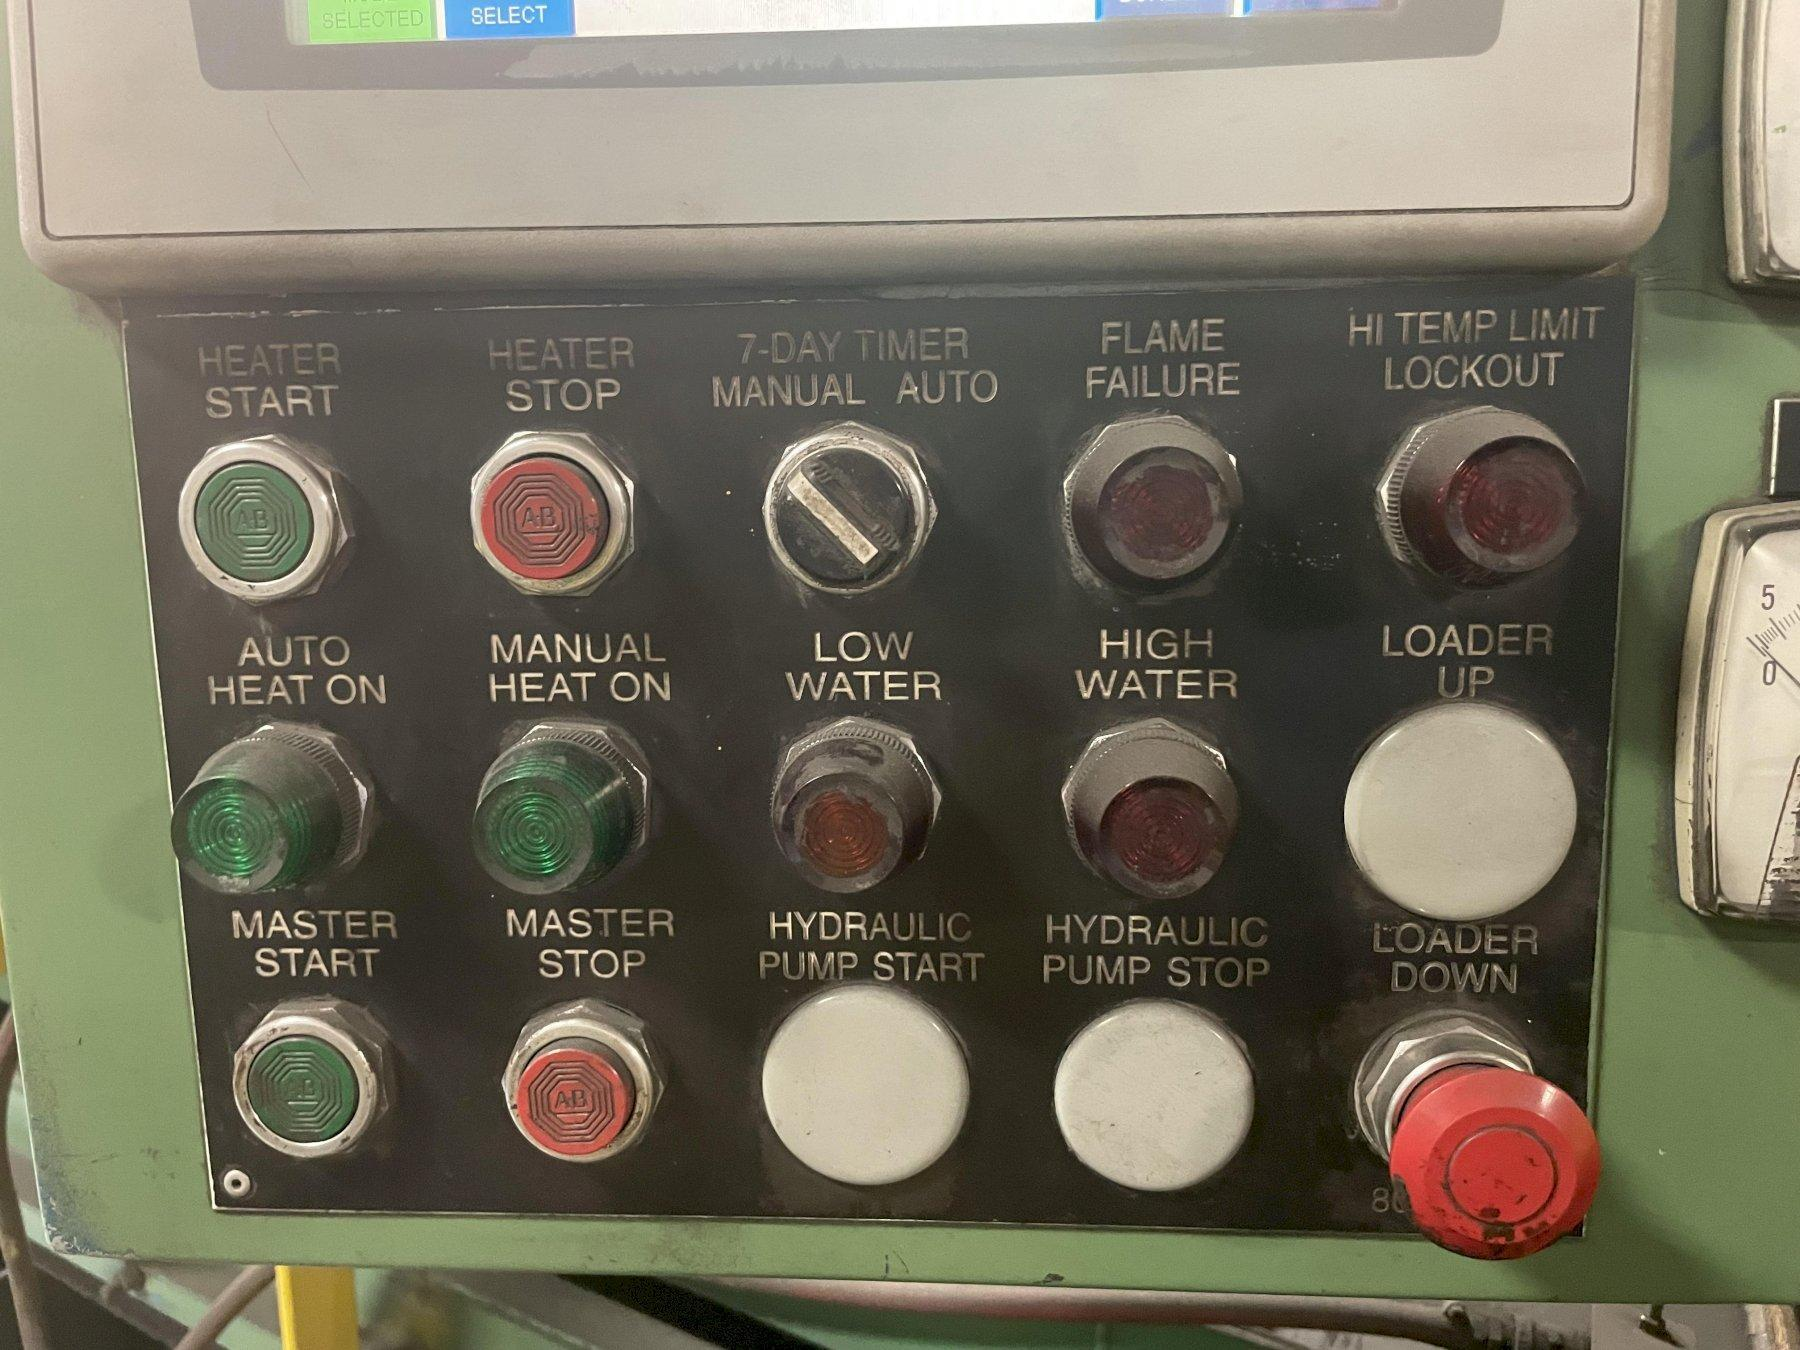 6 FT GOFF MODEL #6BB AUTOMATIC WASH & BLAST SYSTEM: STOCK 15379